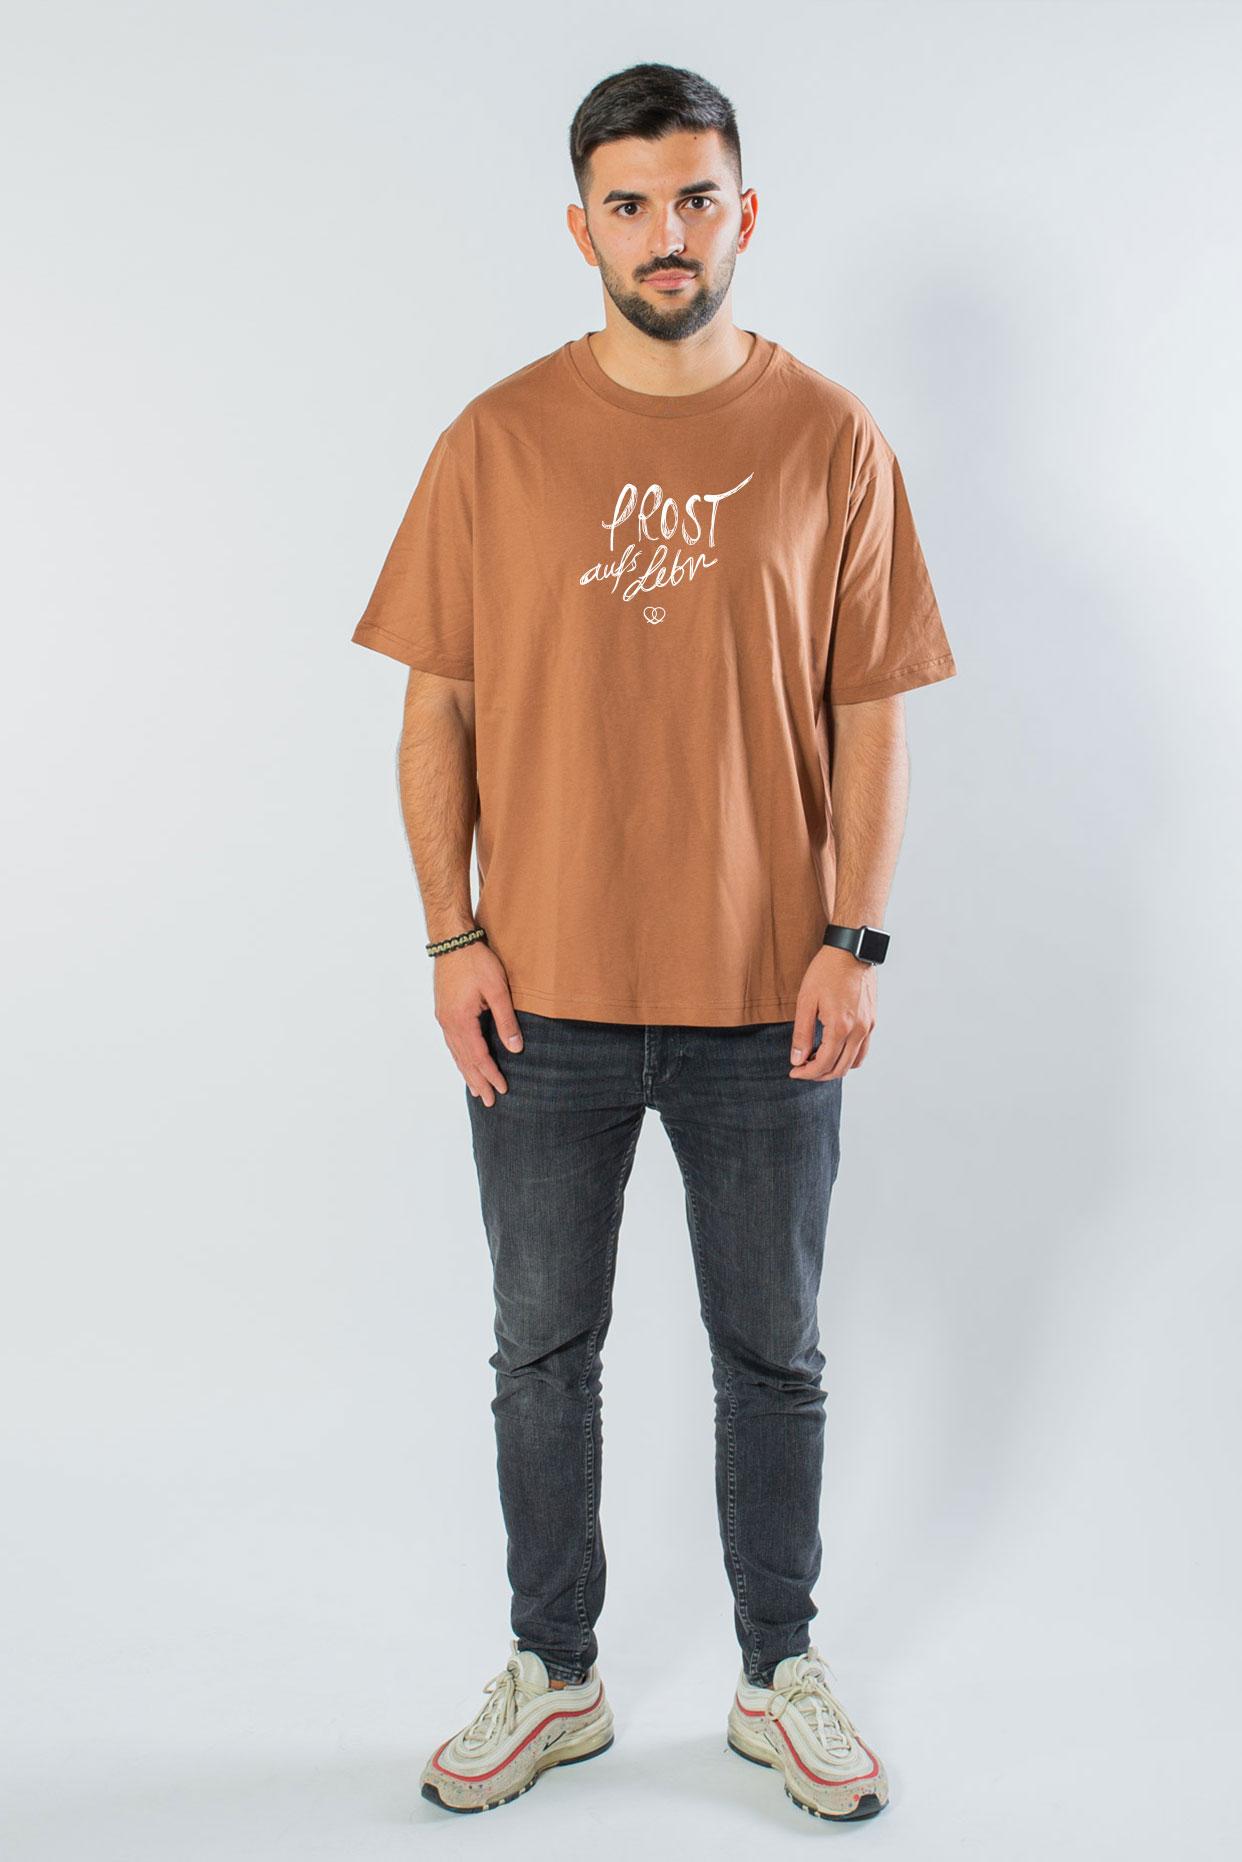 Prost Unisex T-Shirt